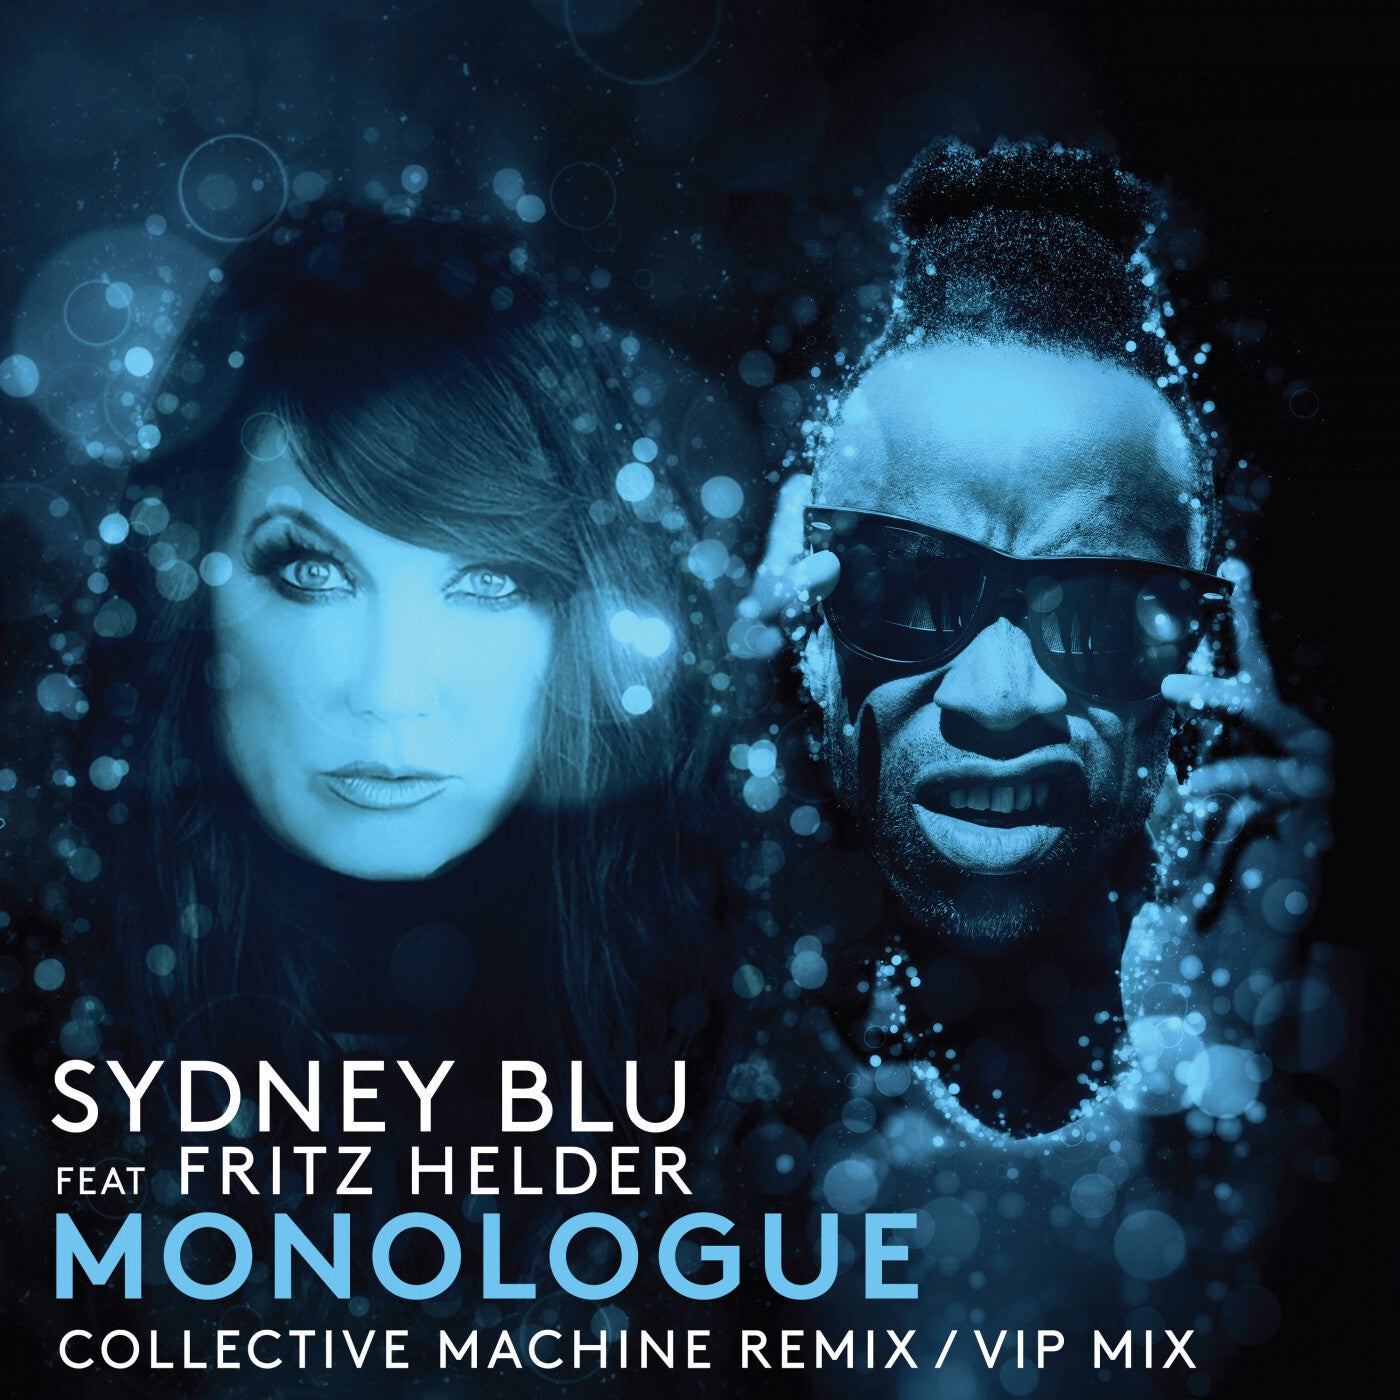 Monologue (Collective Machine Remix)